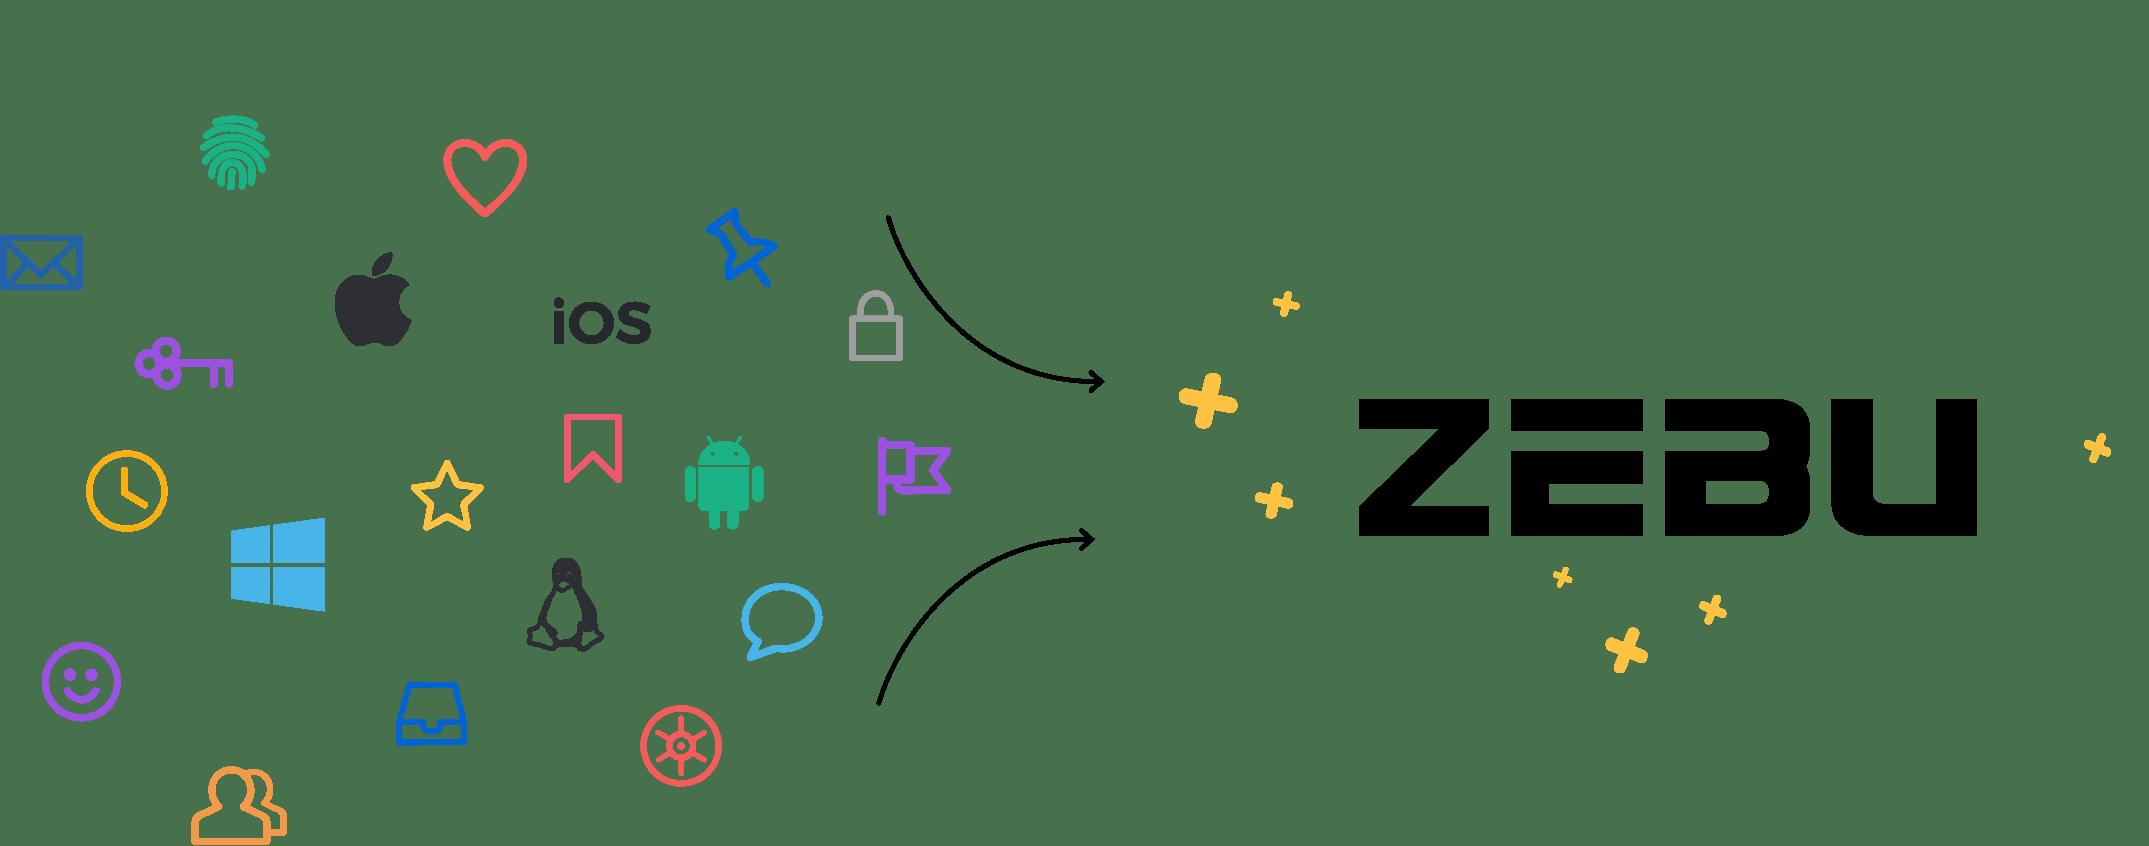 zebu uses all sorts of platform diagrams